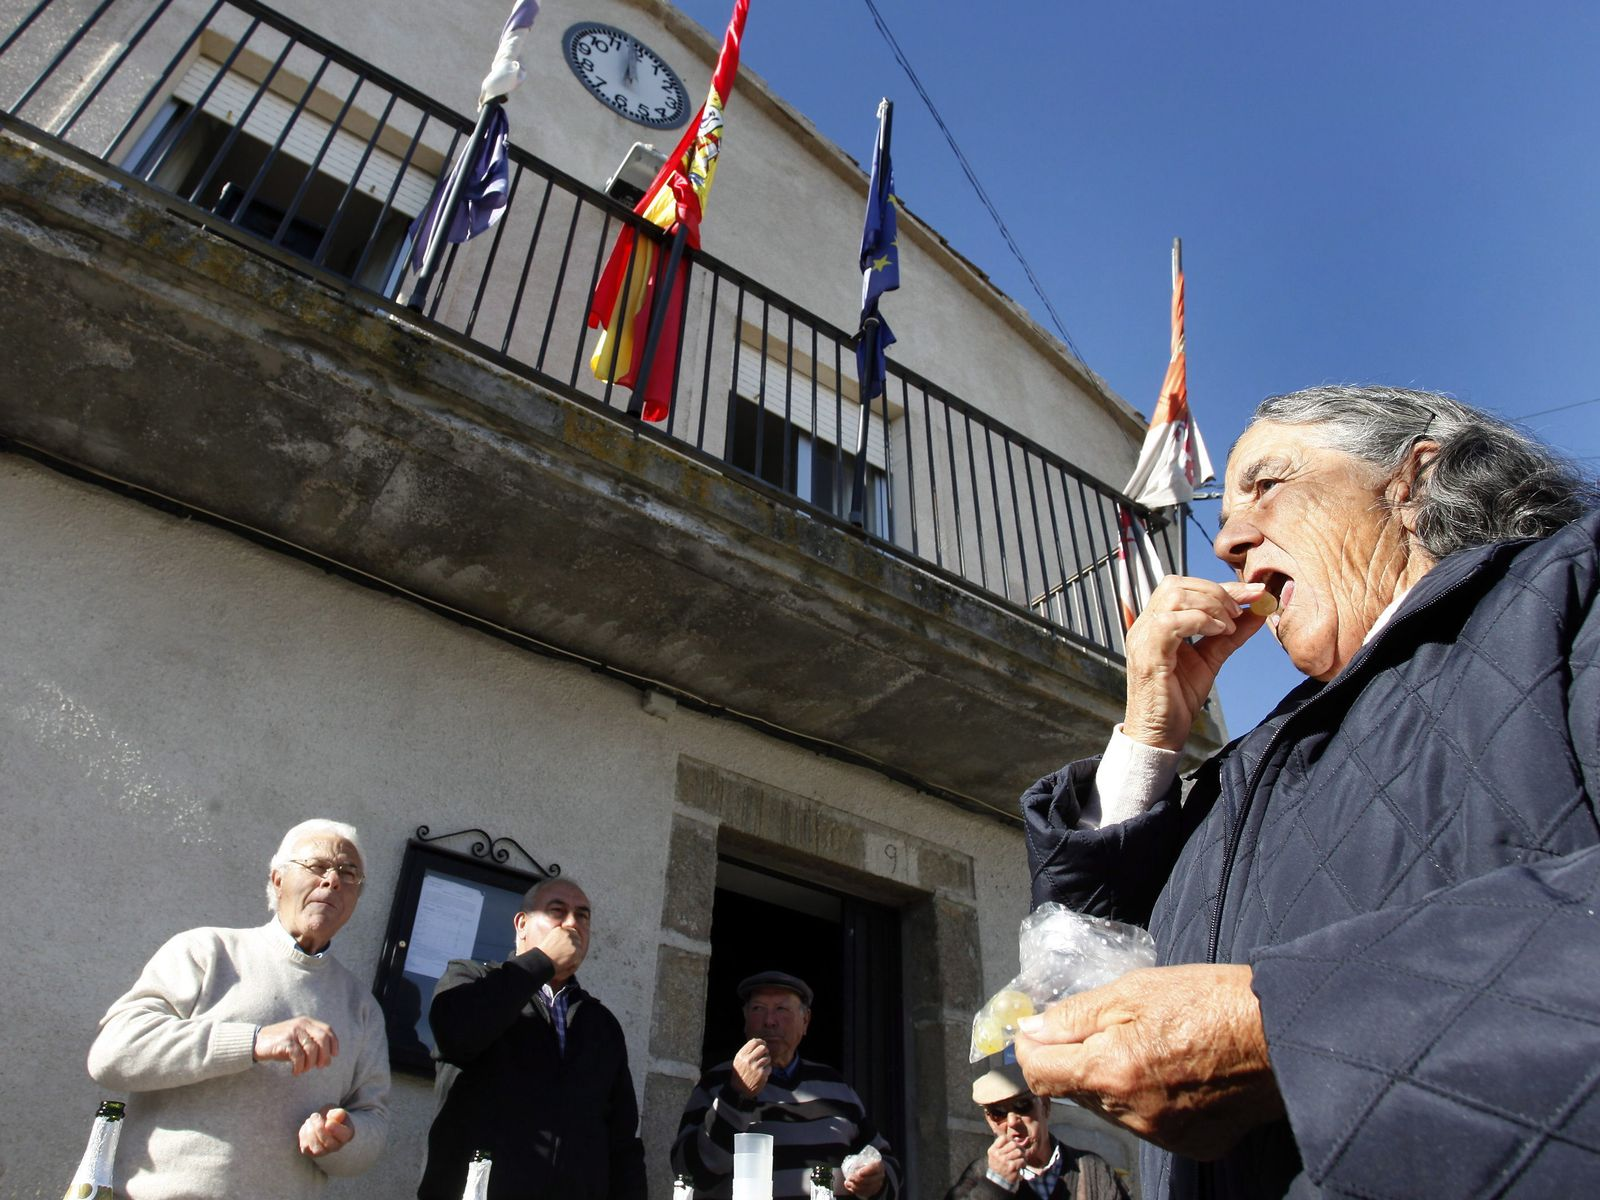 Villar de Corneja/ Neues Jahr